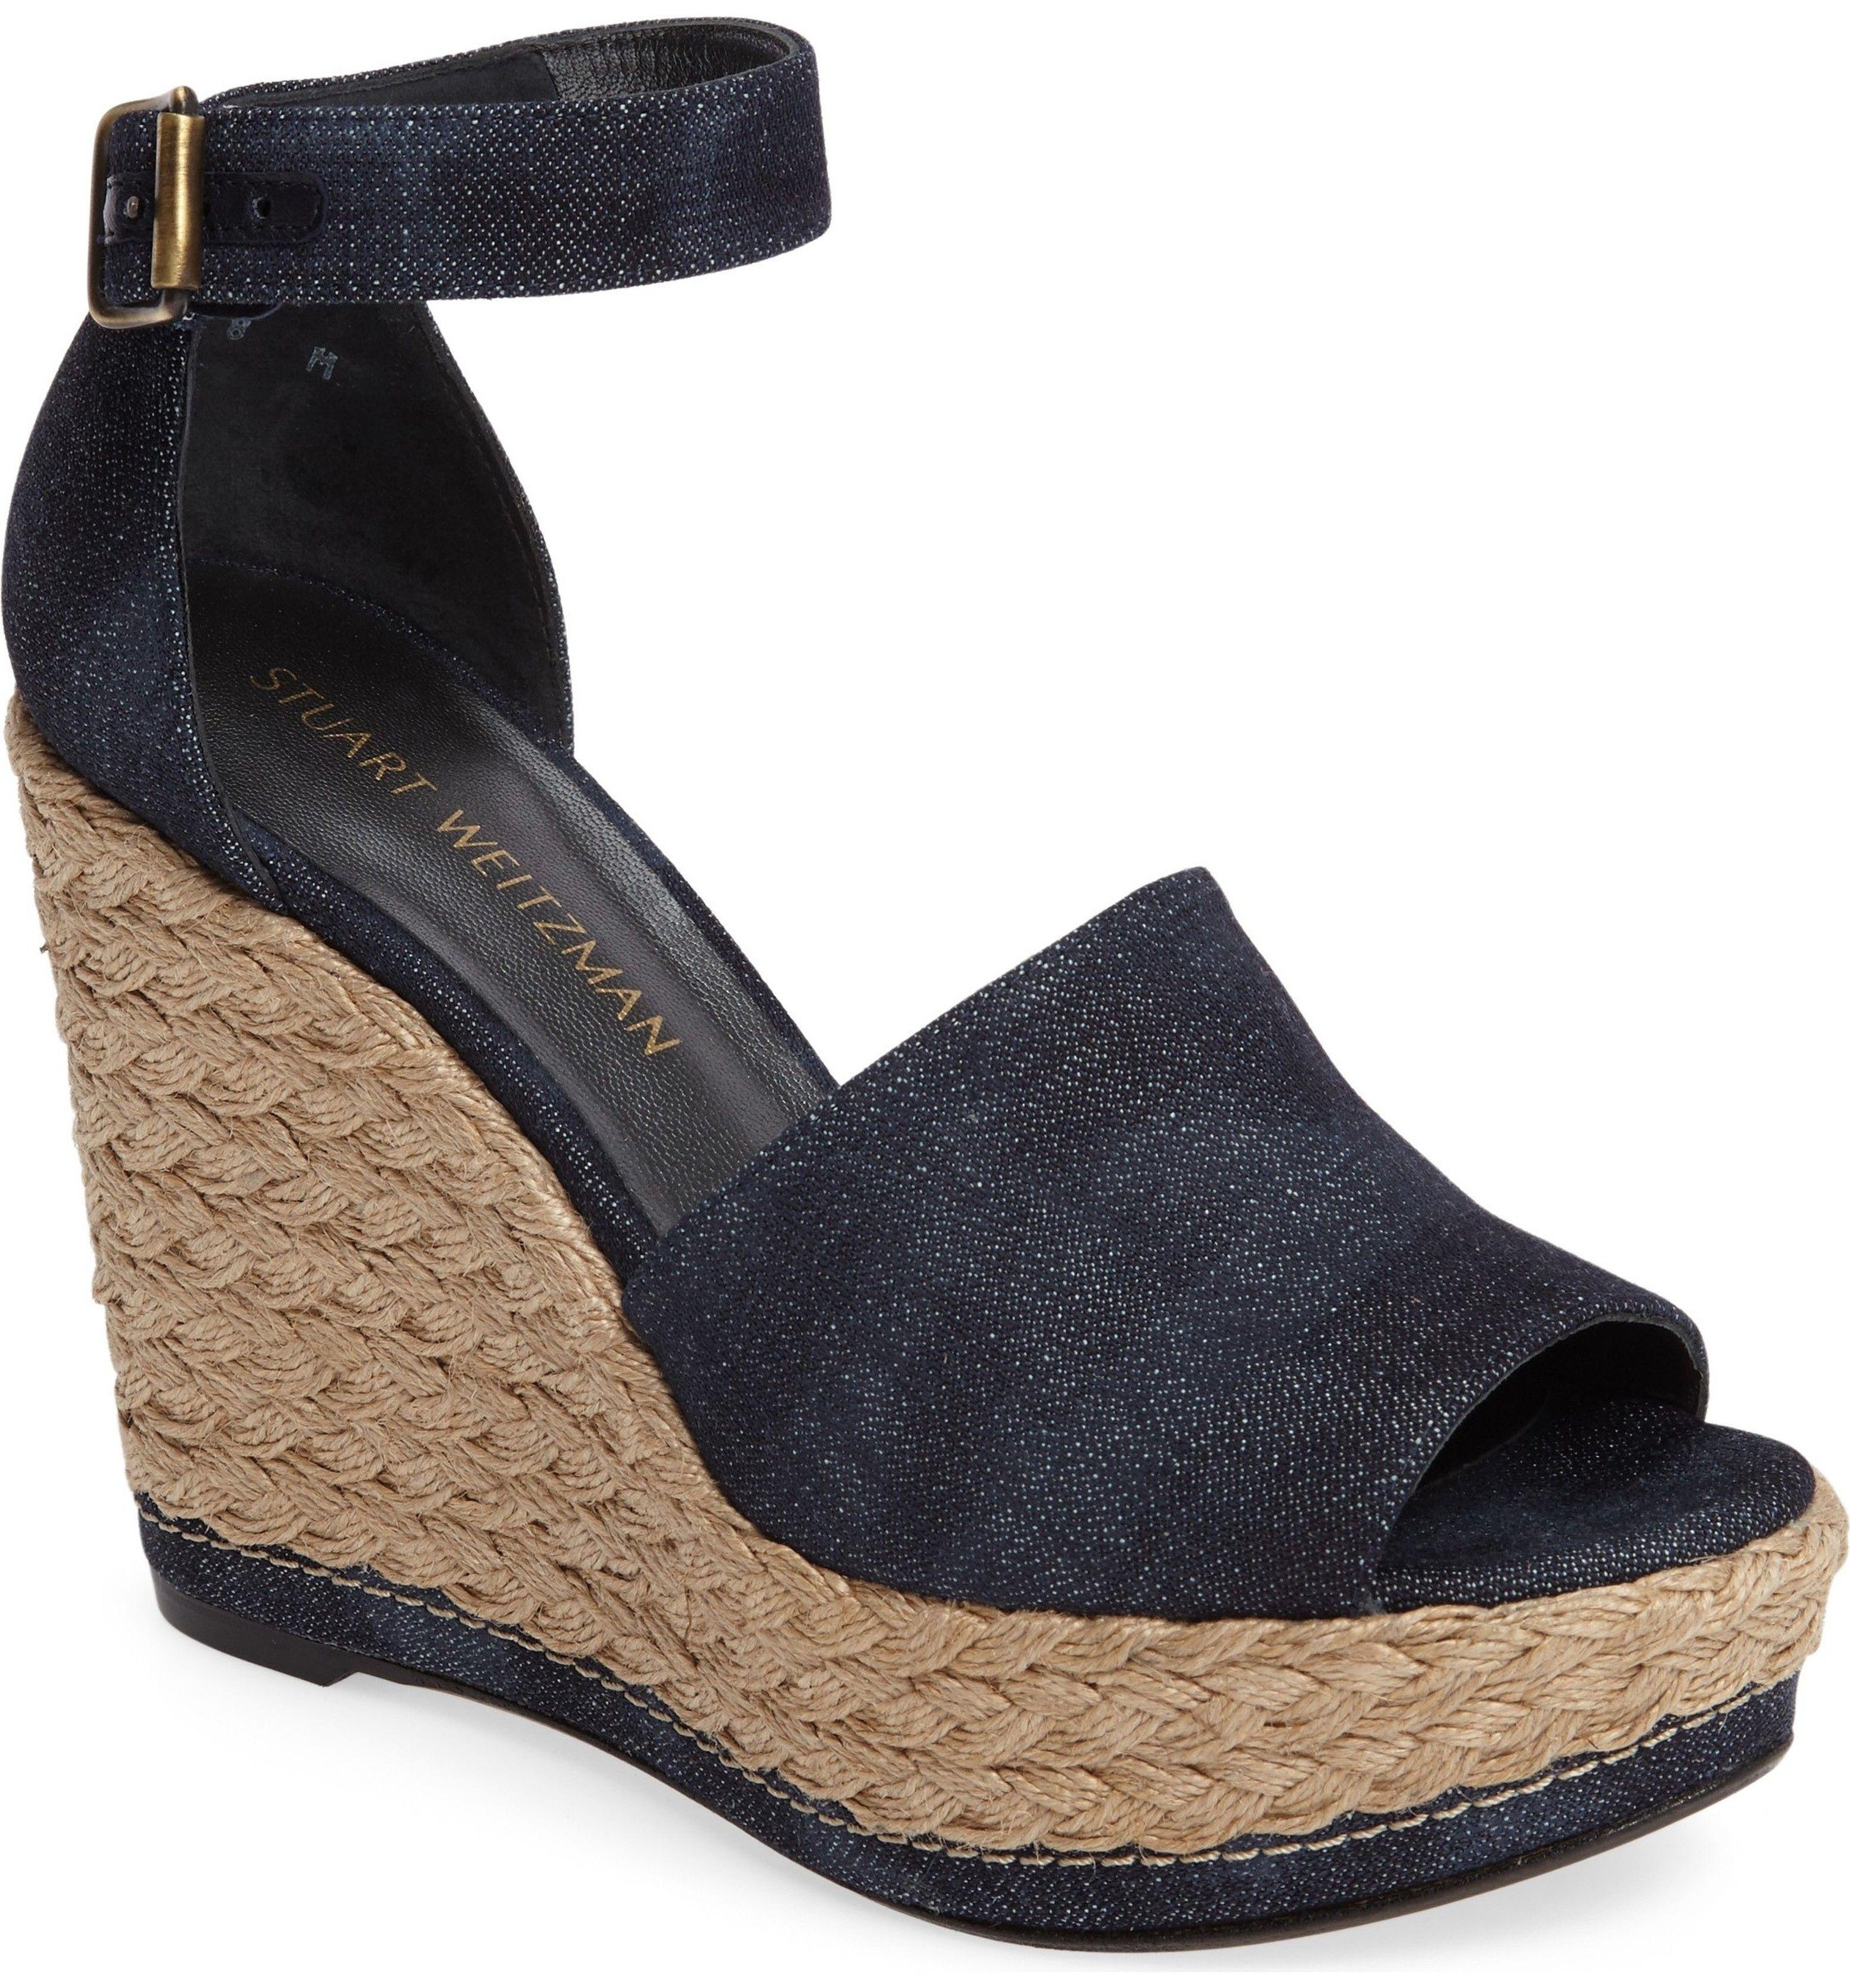 96b50c276a1 Main Image - Stuart Weitzman Sohojute Platform Wedge Sandal (Women ...